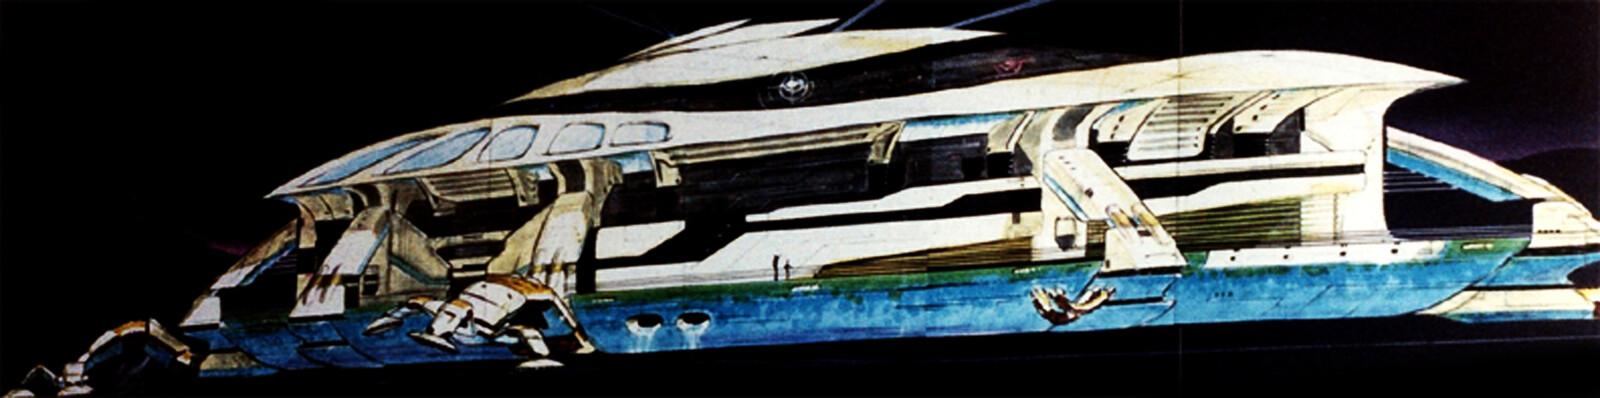 TOMORROWLAND - Main Ship - Disneyland